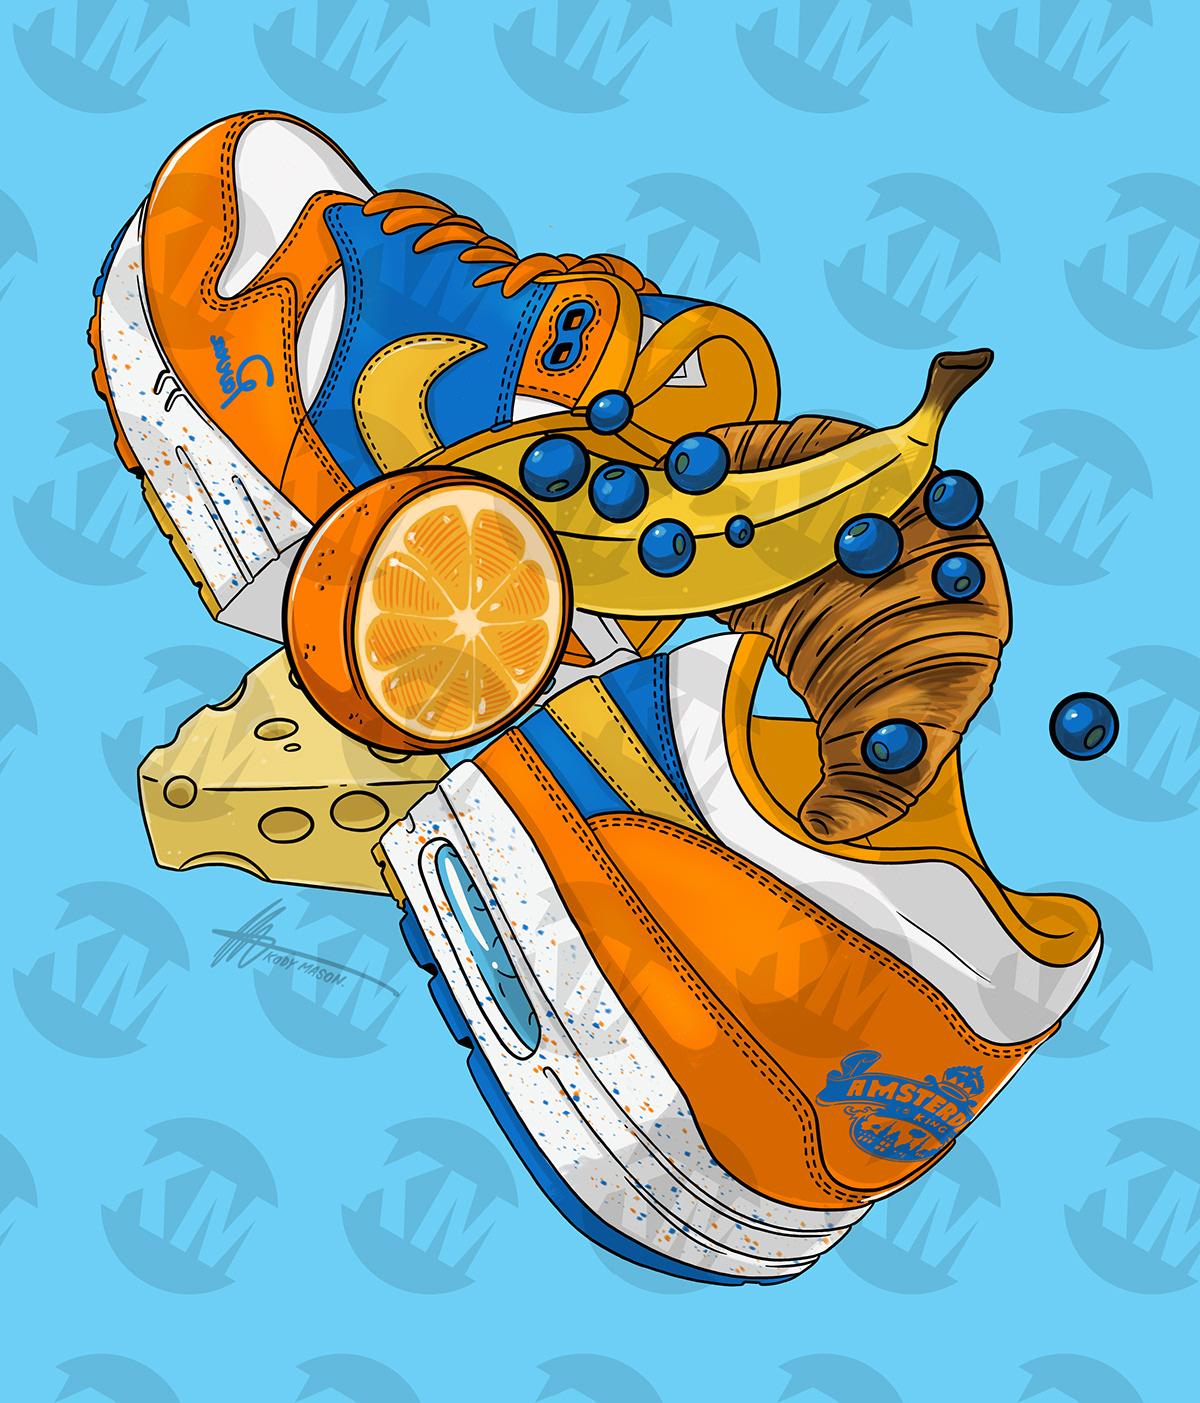 Air Max 1 Albert Heijn Sneaker Illustration On Behance